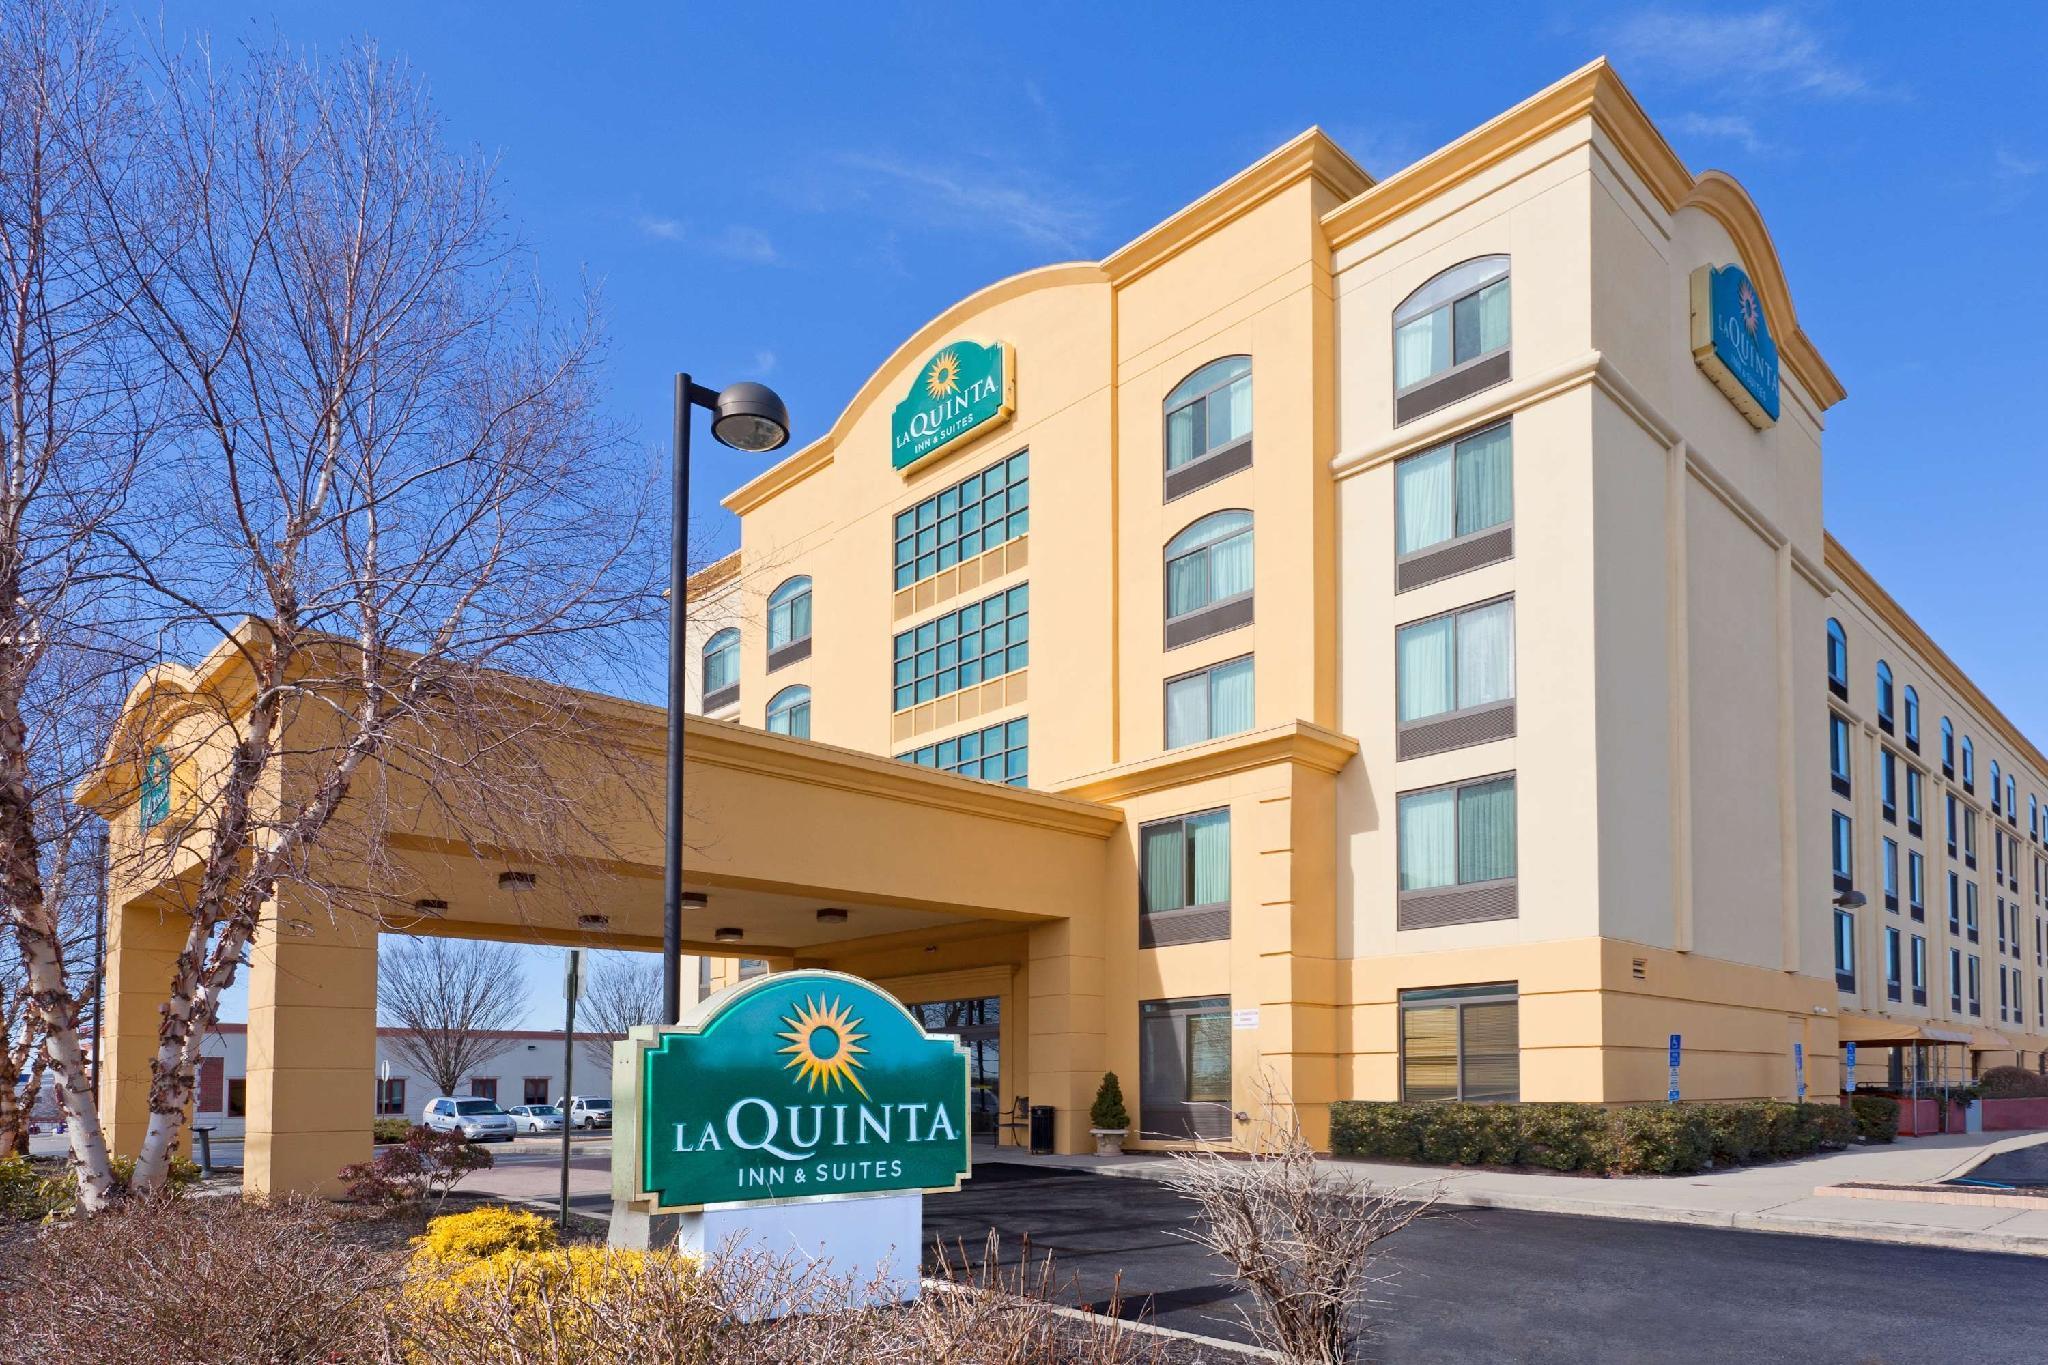 La Quinta Inn & Suites by Wyndham Garden City